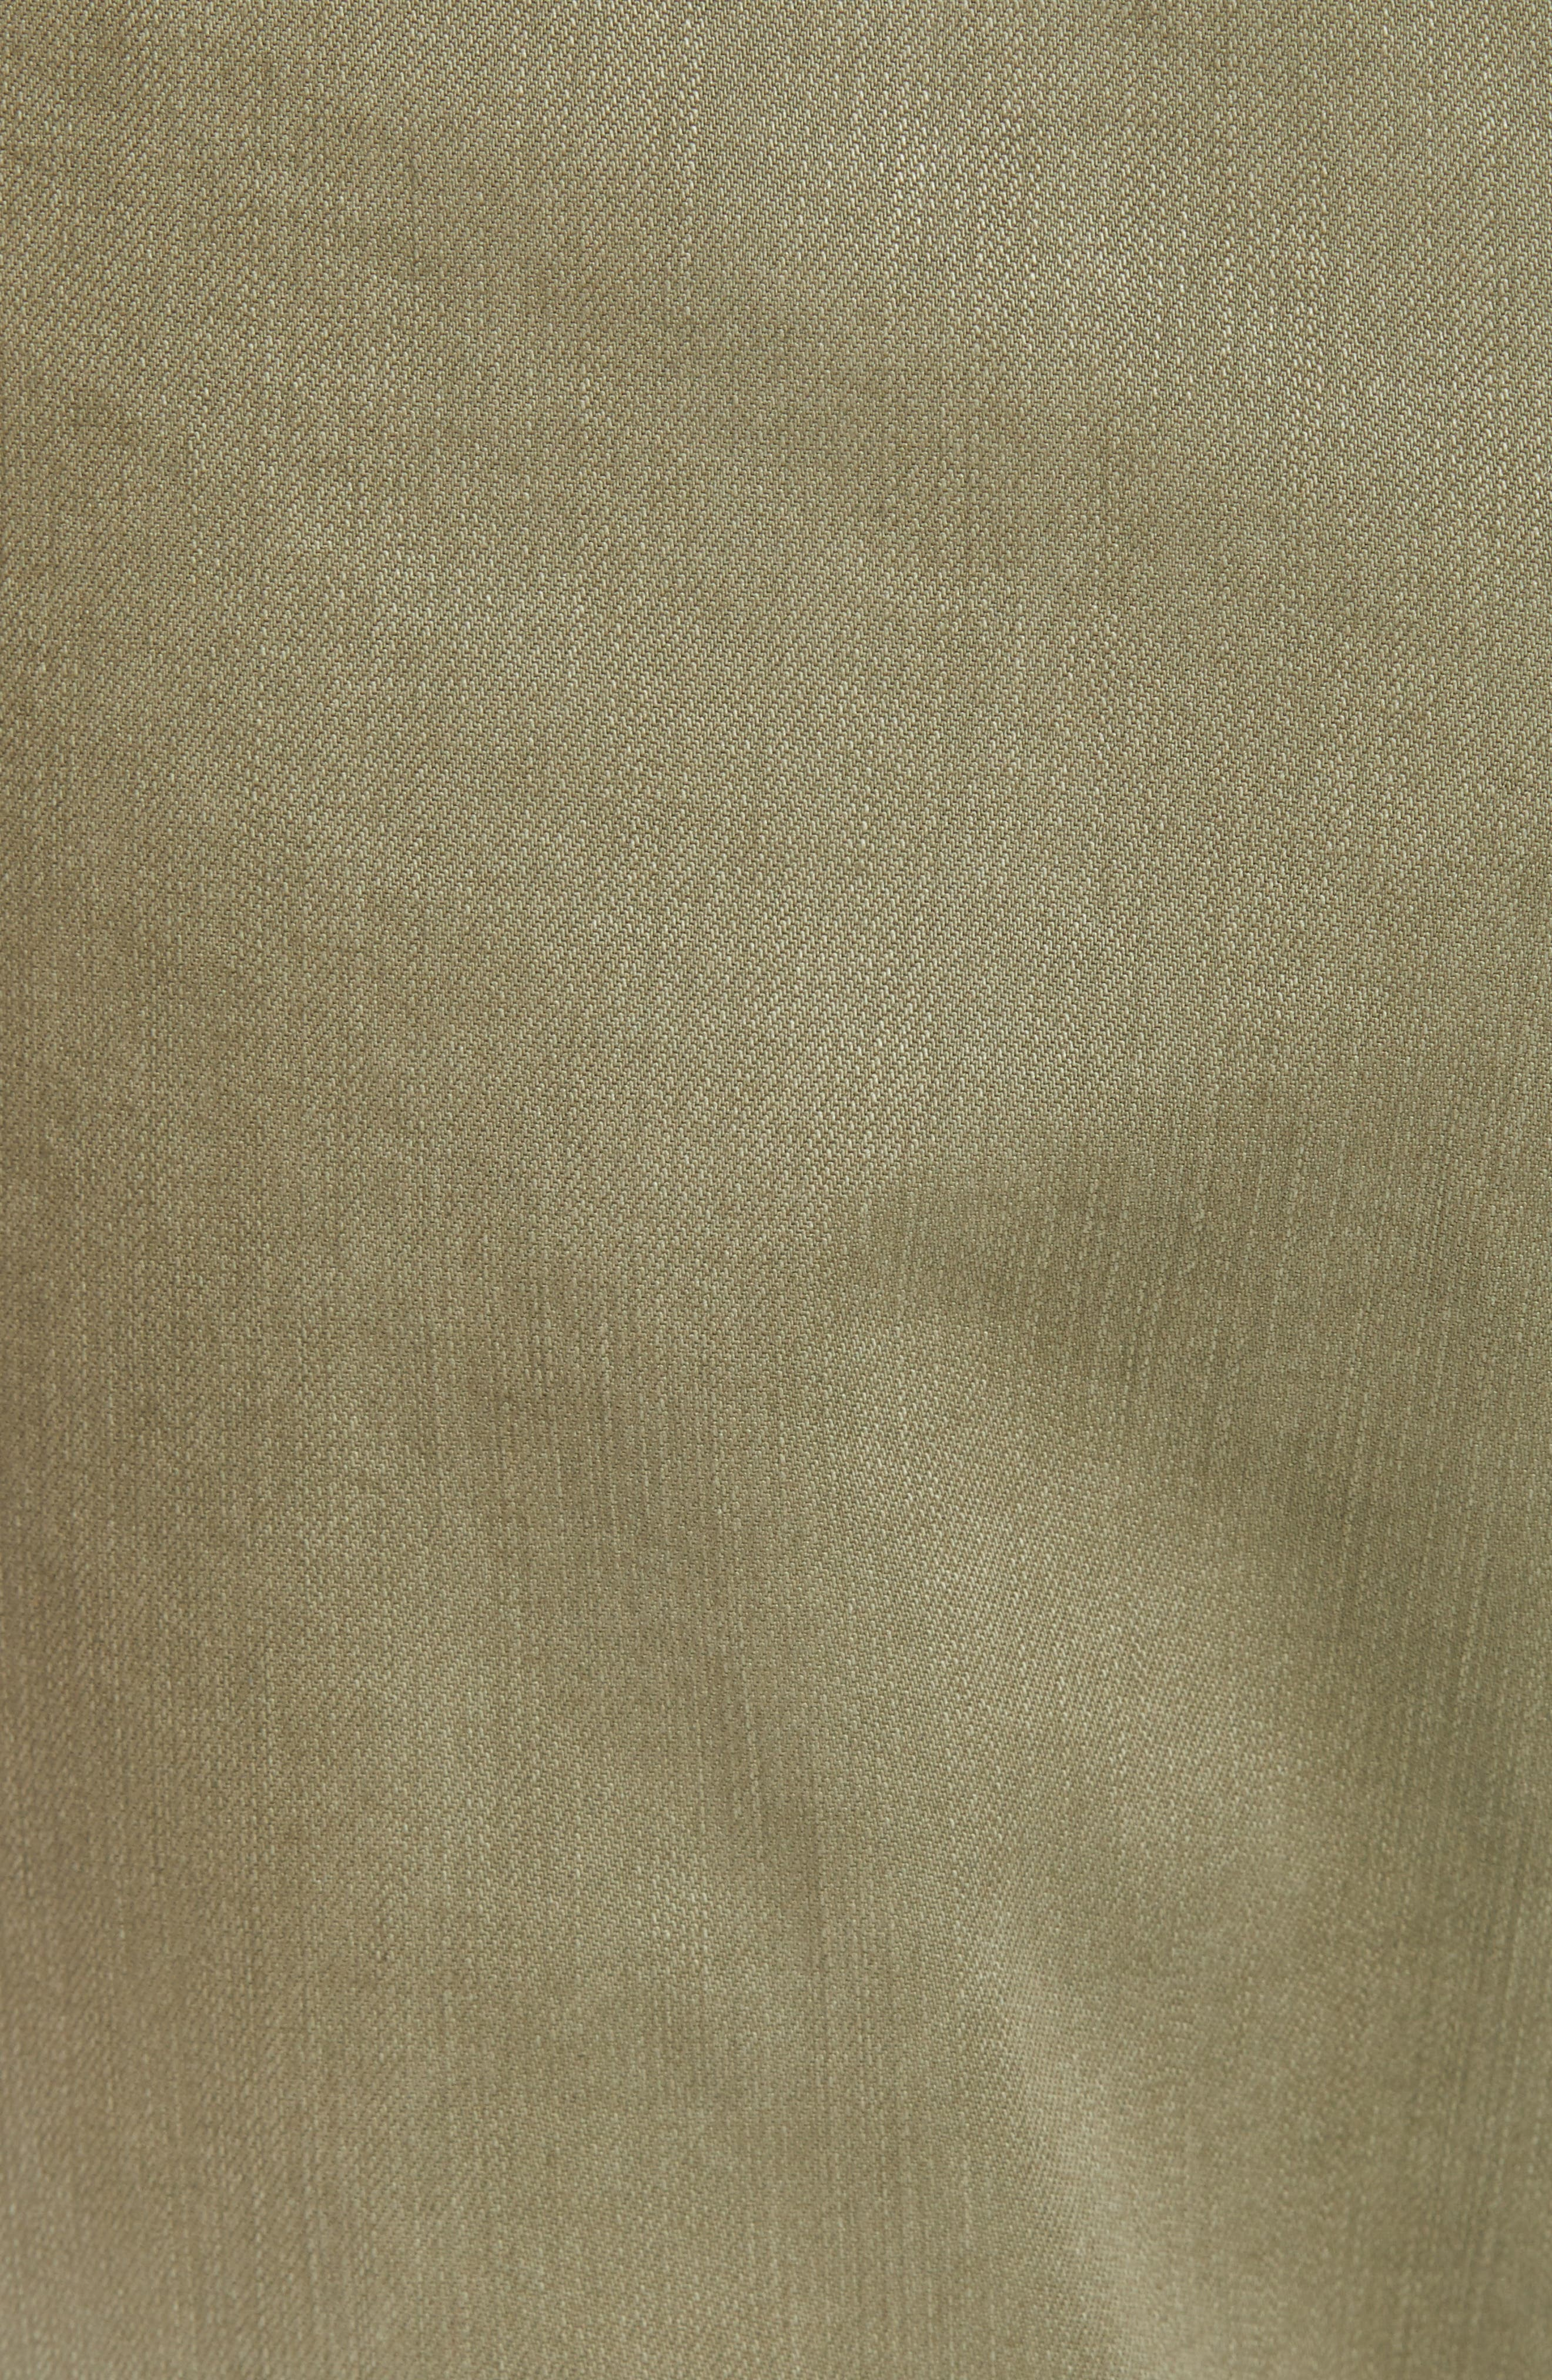 Jimmy Slim Straight Leg Jeans,                             Alternate thumbnail 5, color,                             300